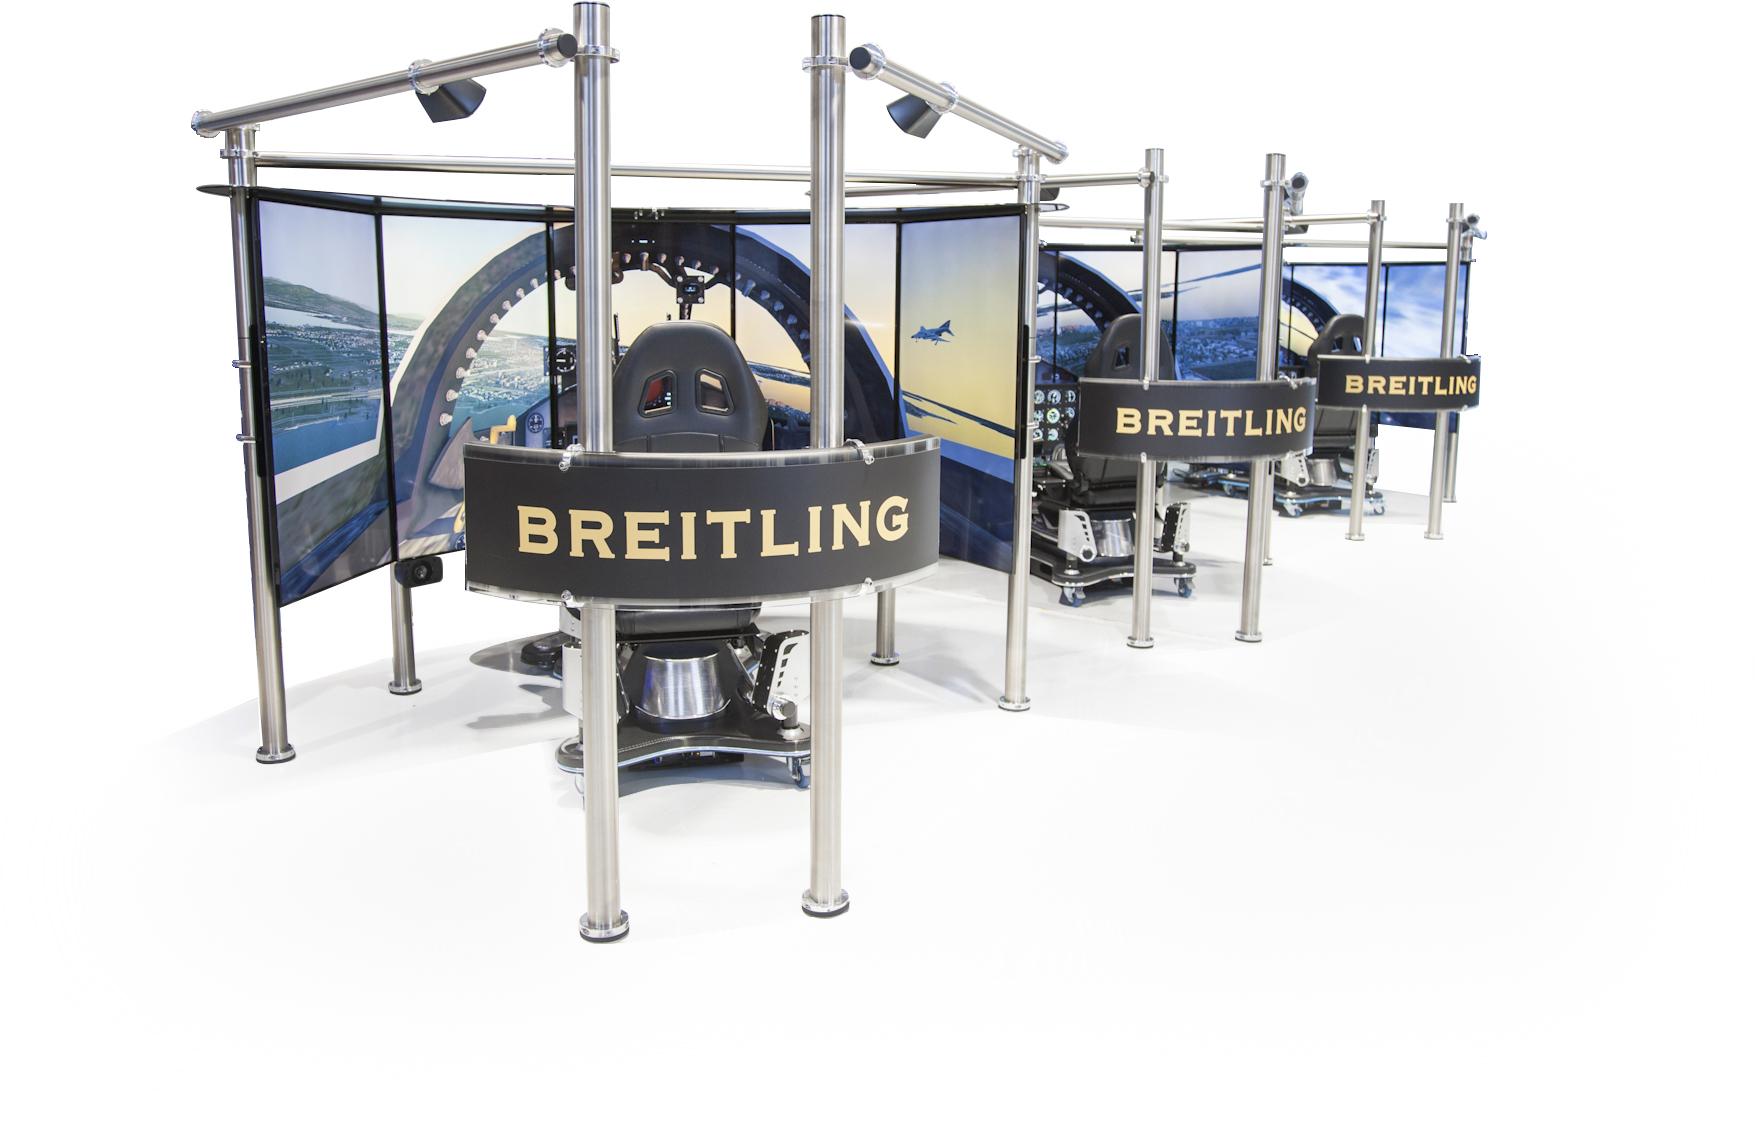 VRX Simulators - Experience the World's Best Simulators